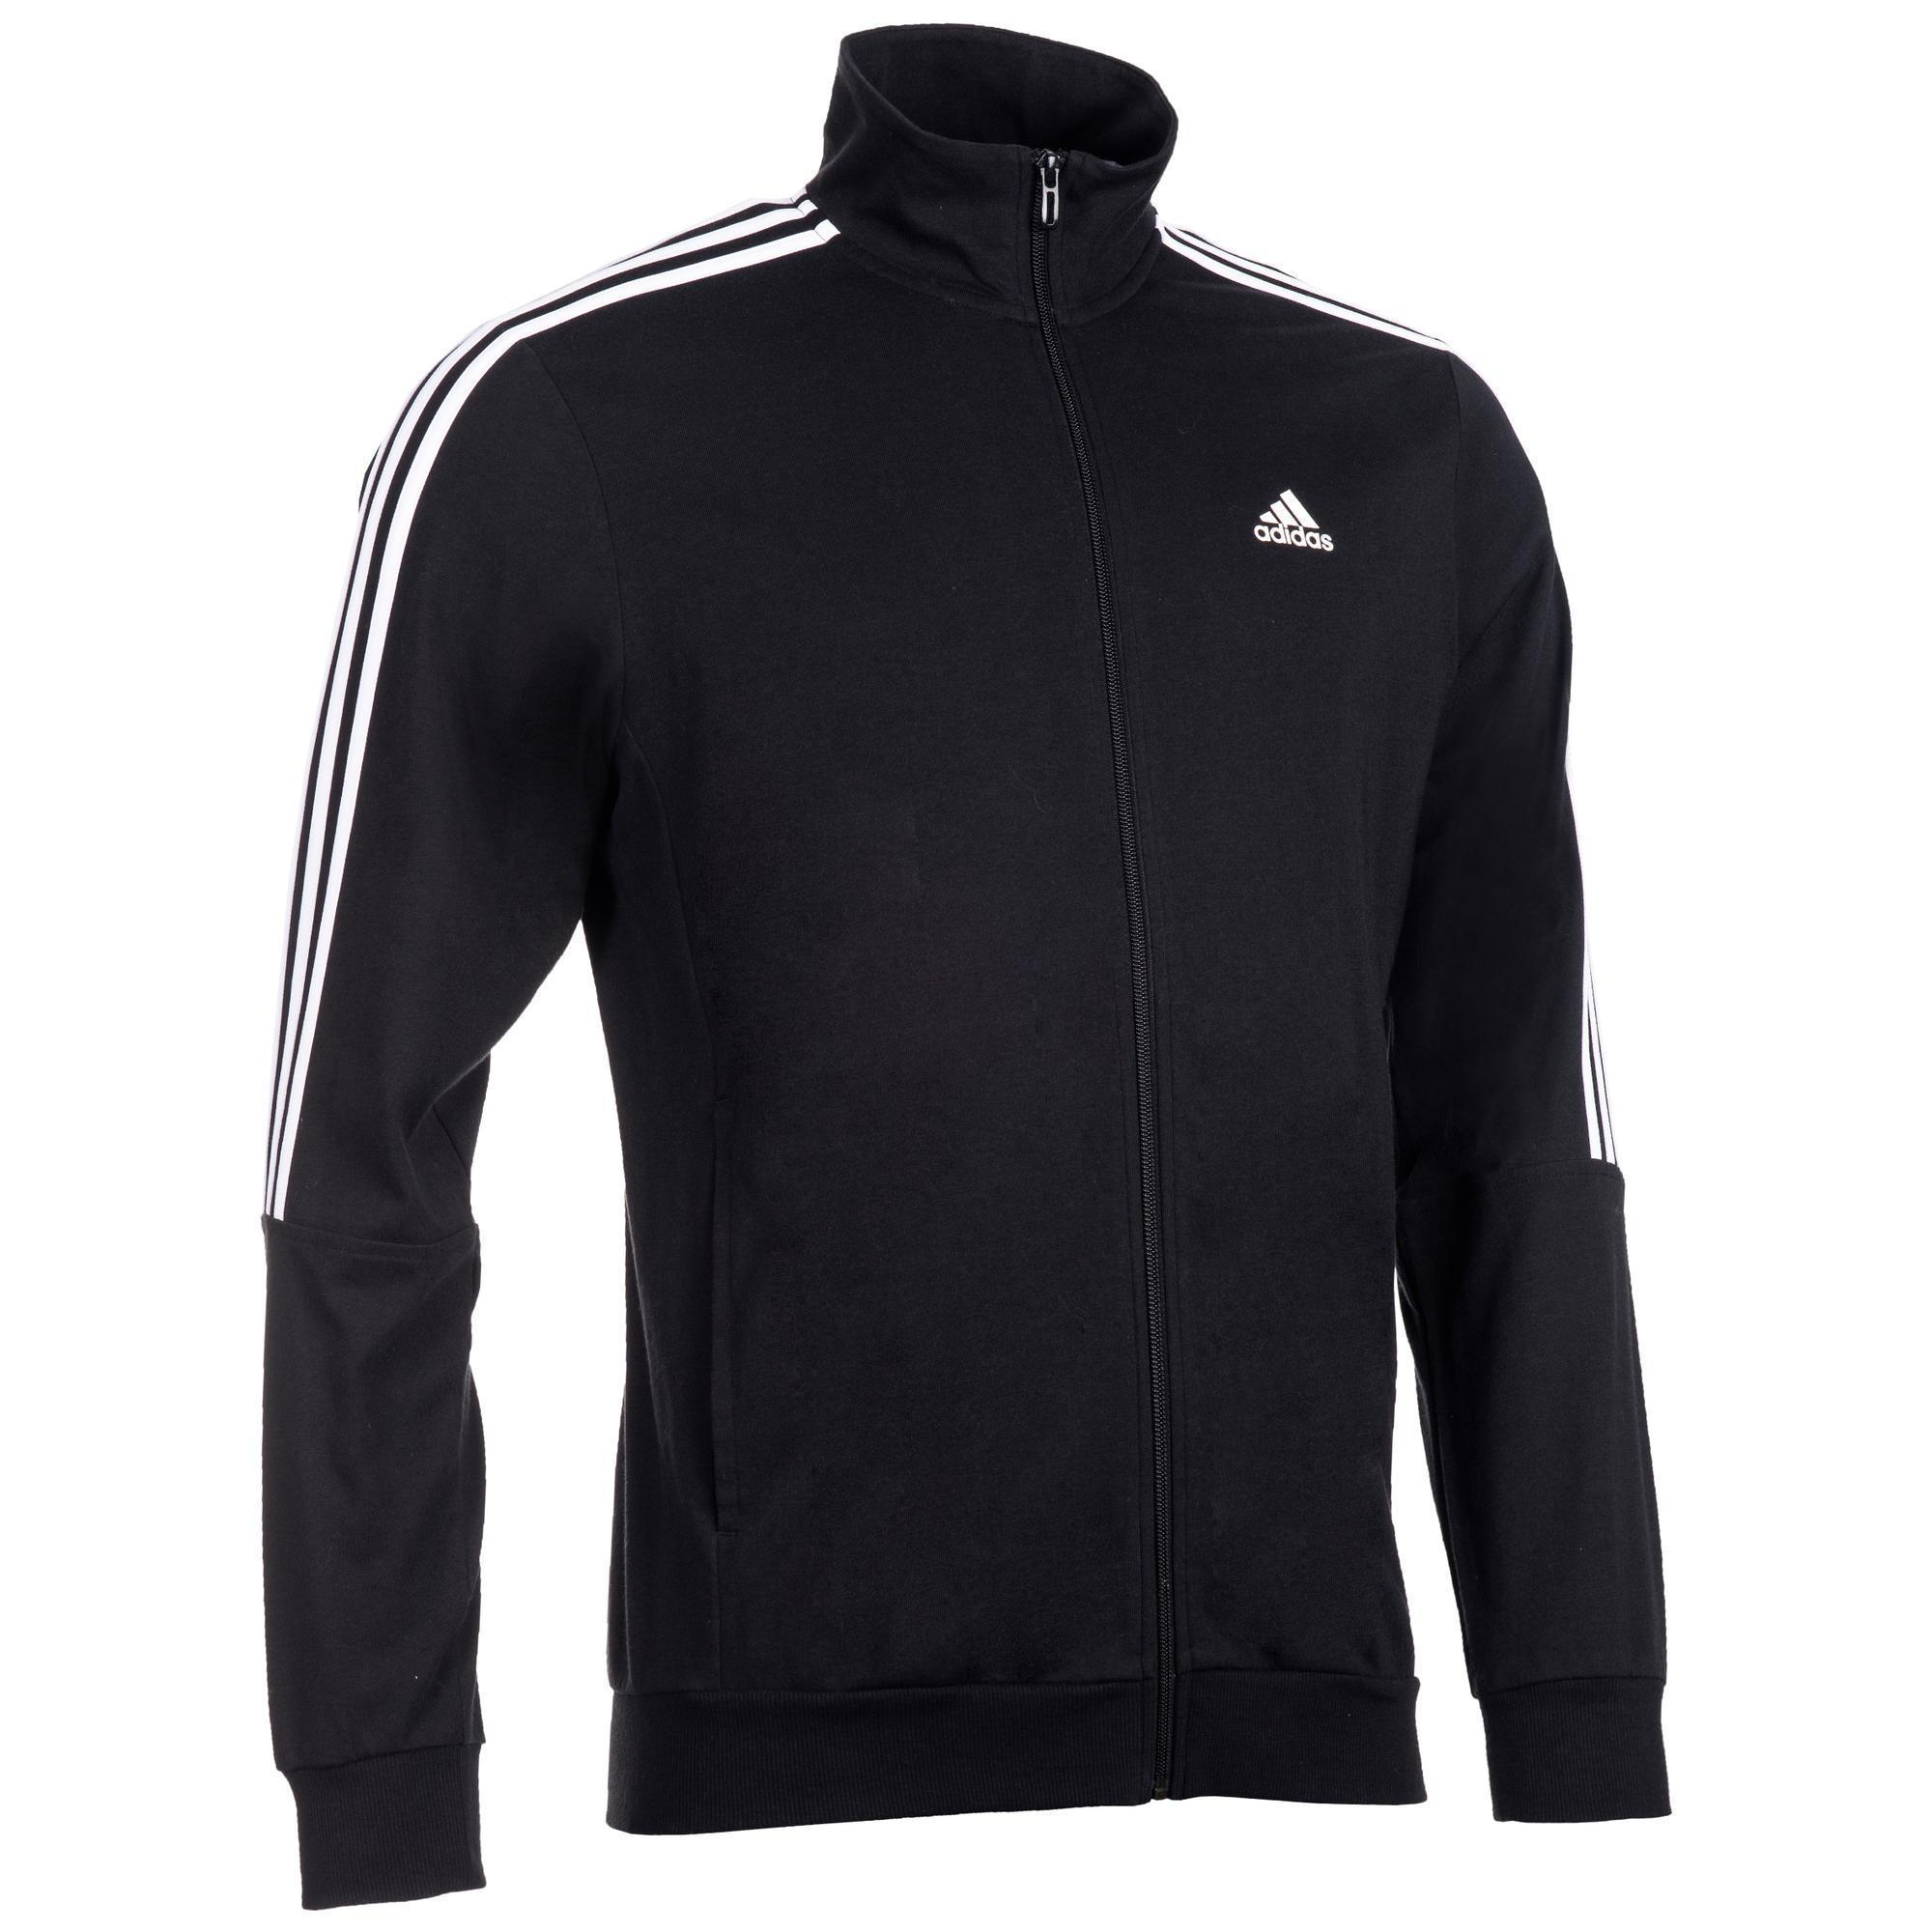 Sudadera Adidas Negra con Cremallera